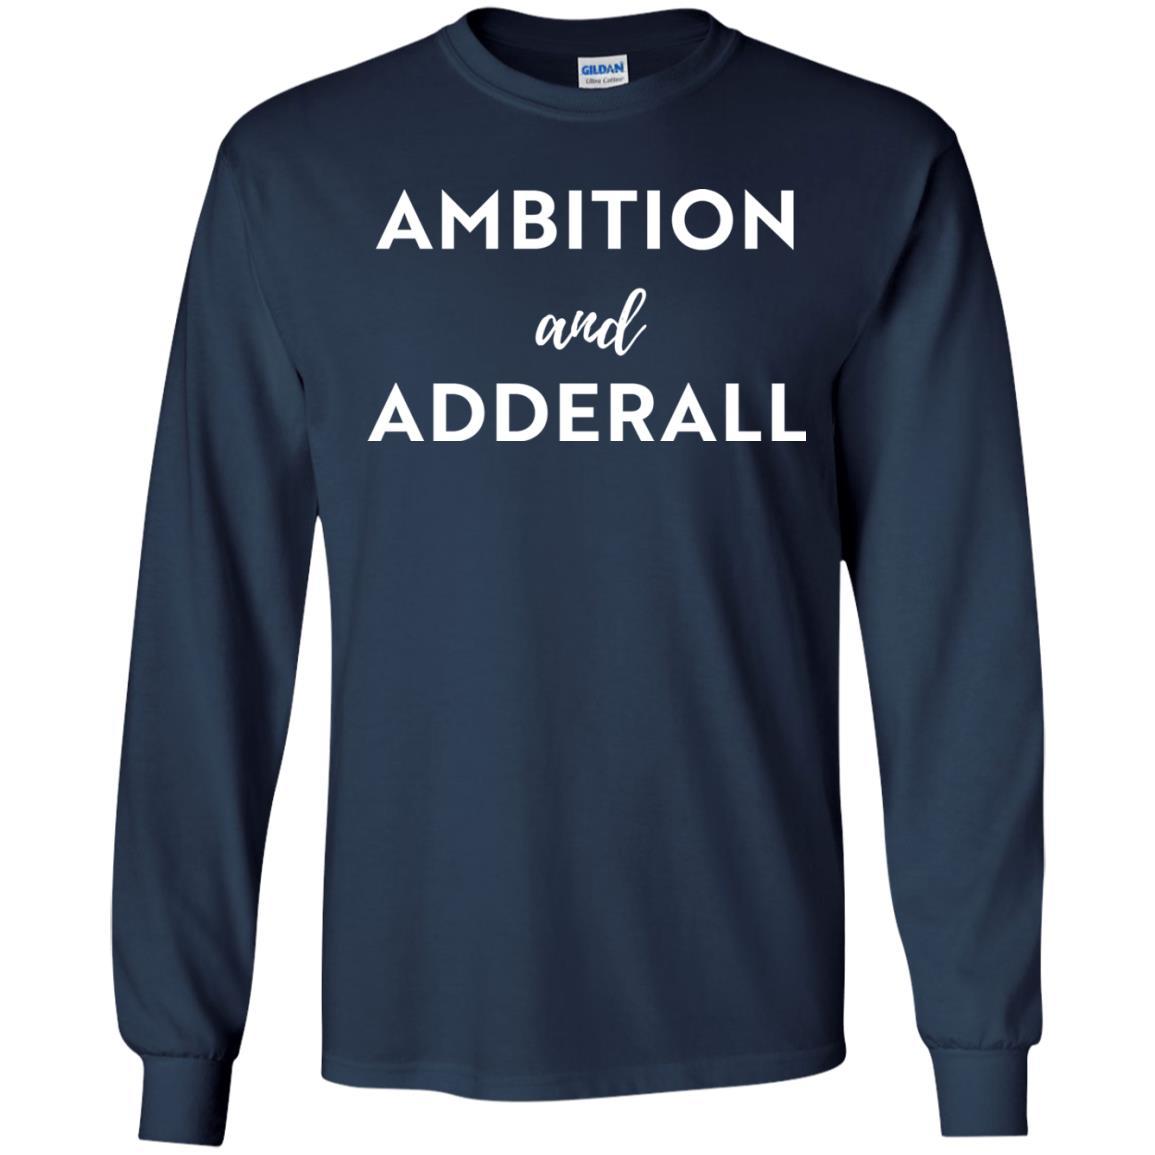 image 4 - Ambition and Adderall T-shirt, Sweatshirt